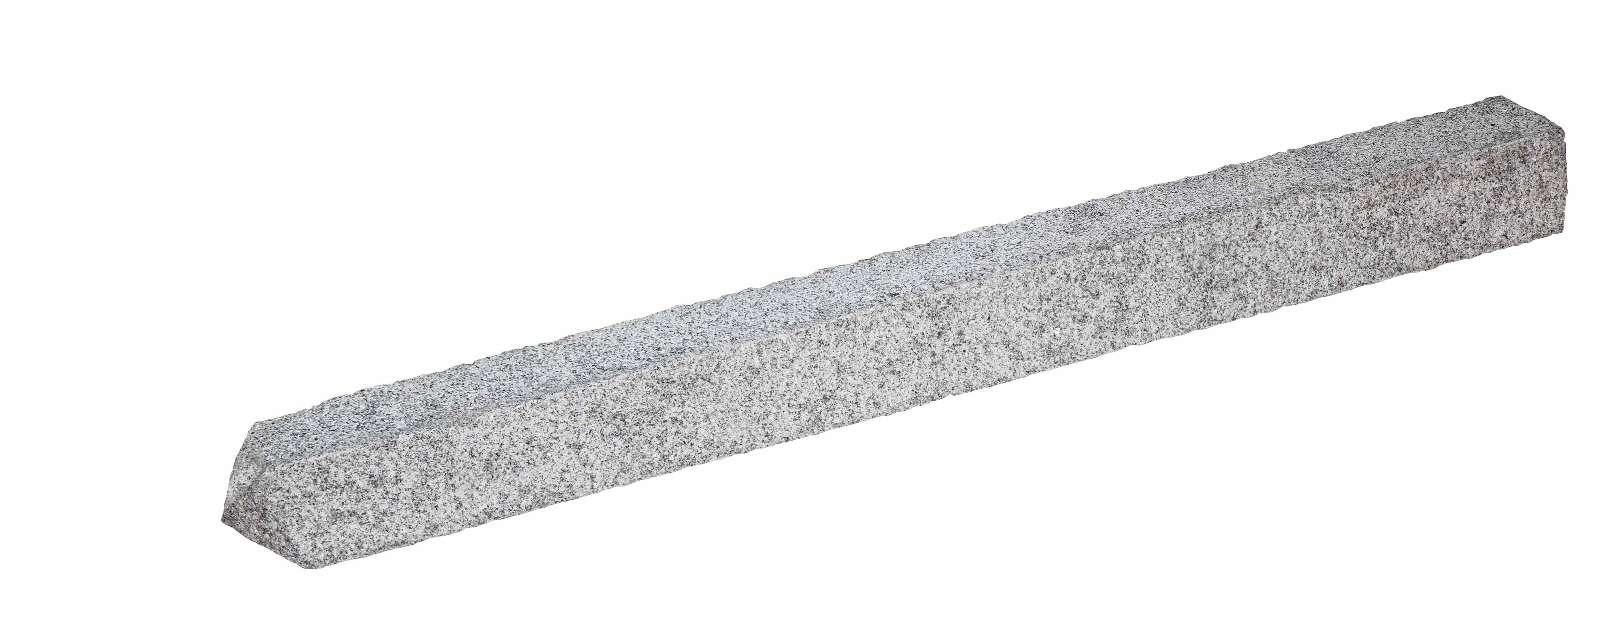 Granit-Zaunpfahl eckig hellgrau 175x15x15